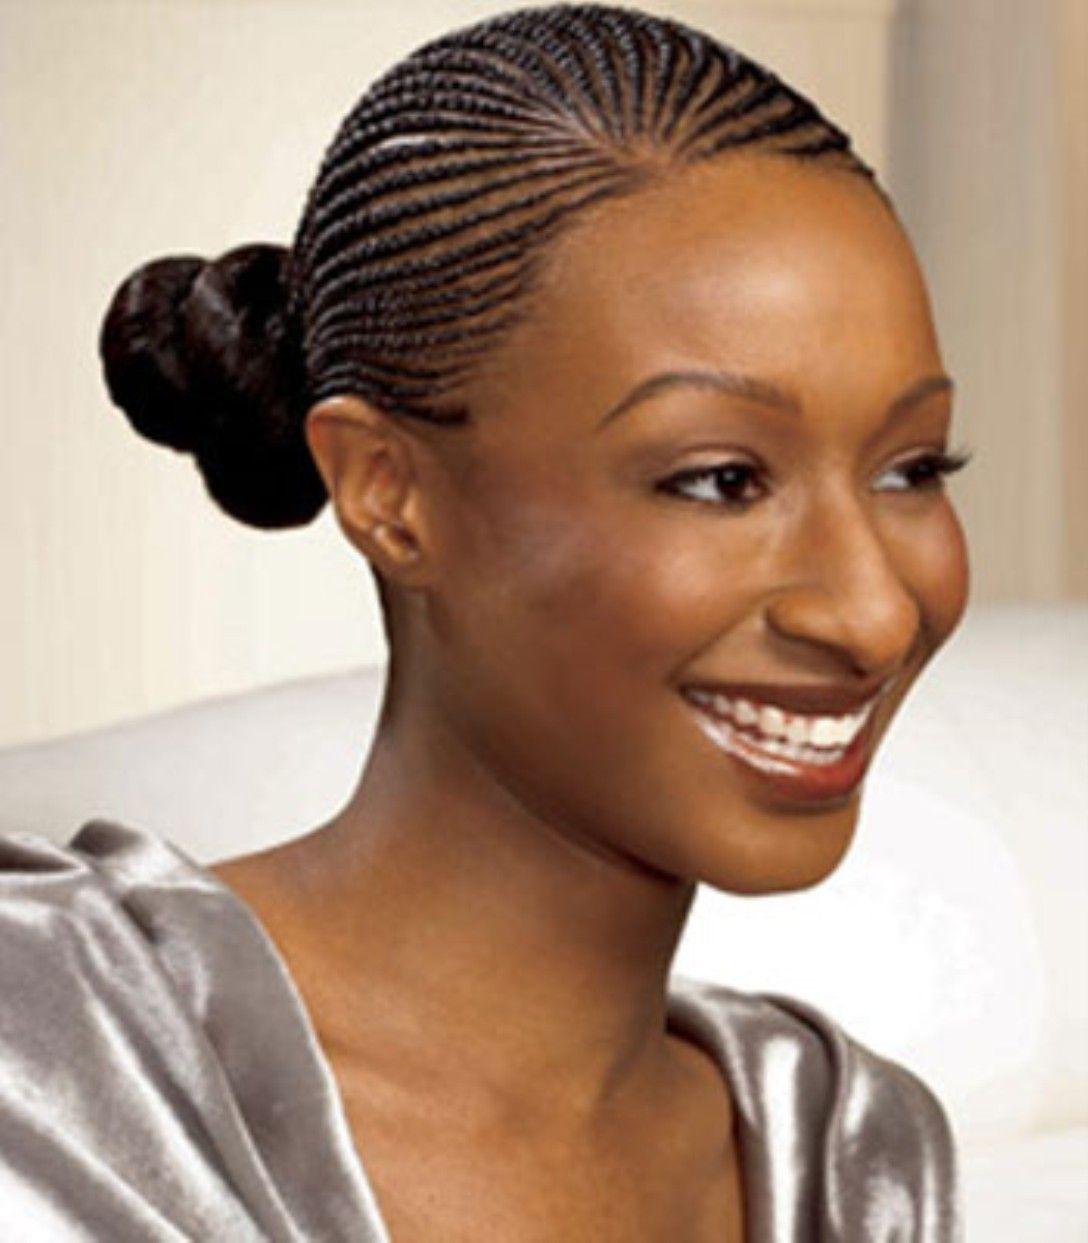 Superb Micro Braids Micro Braids Hairstyles And Braid Hairstyles On Hairstyle Inspiration Daily Dogsangcom